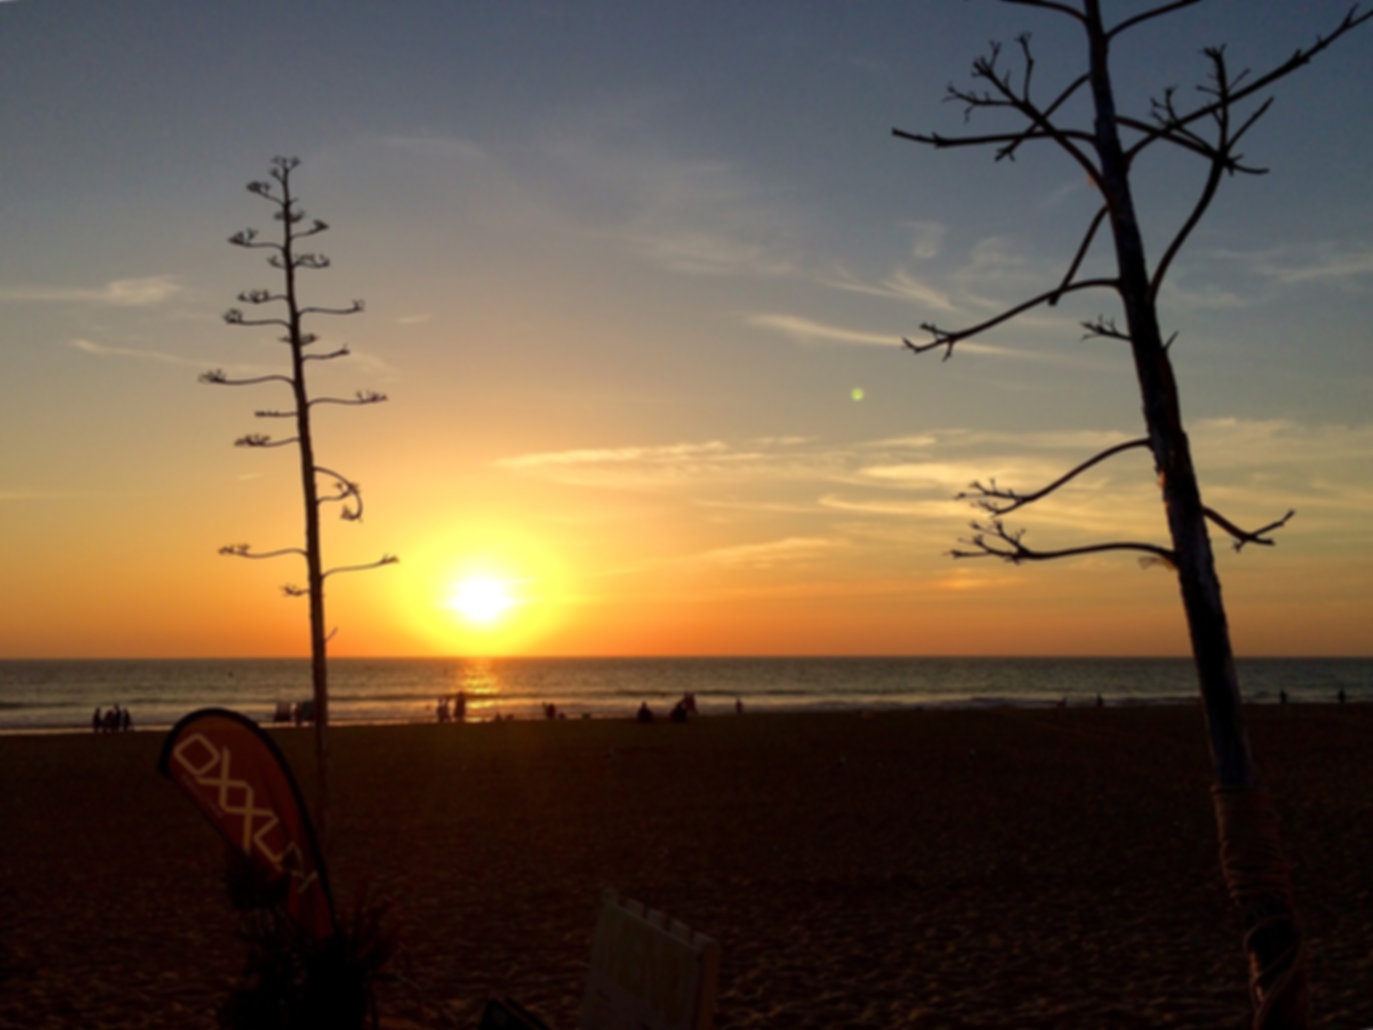 sunset-1694449_1920.jpg